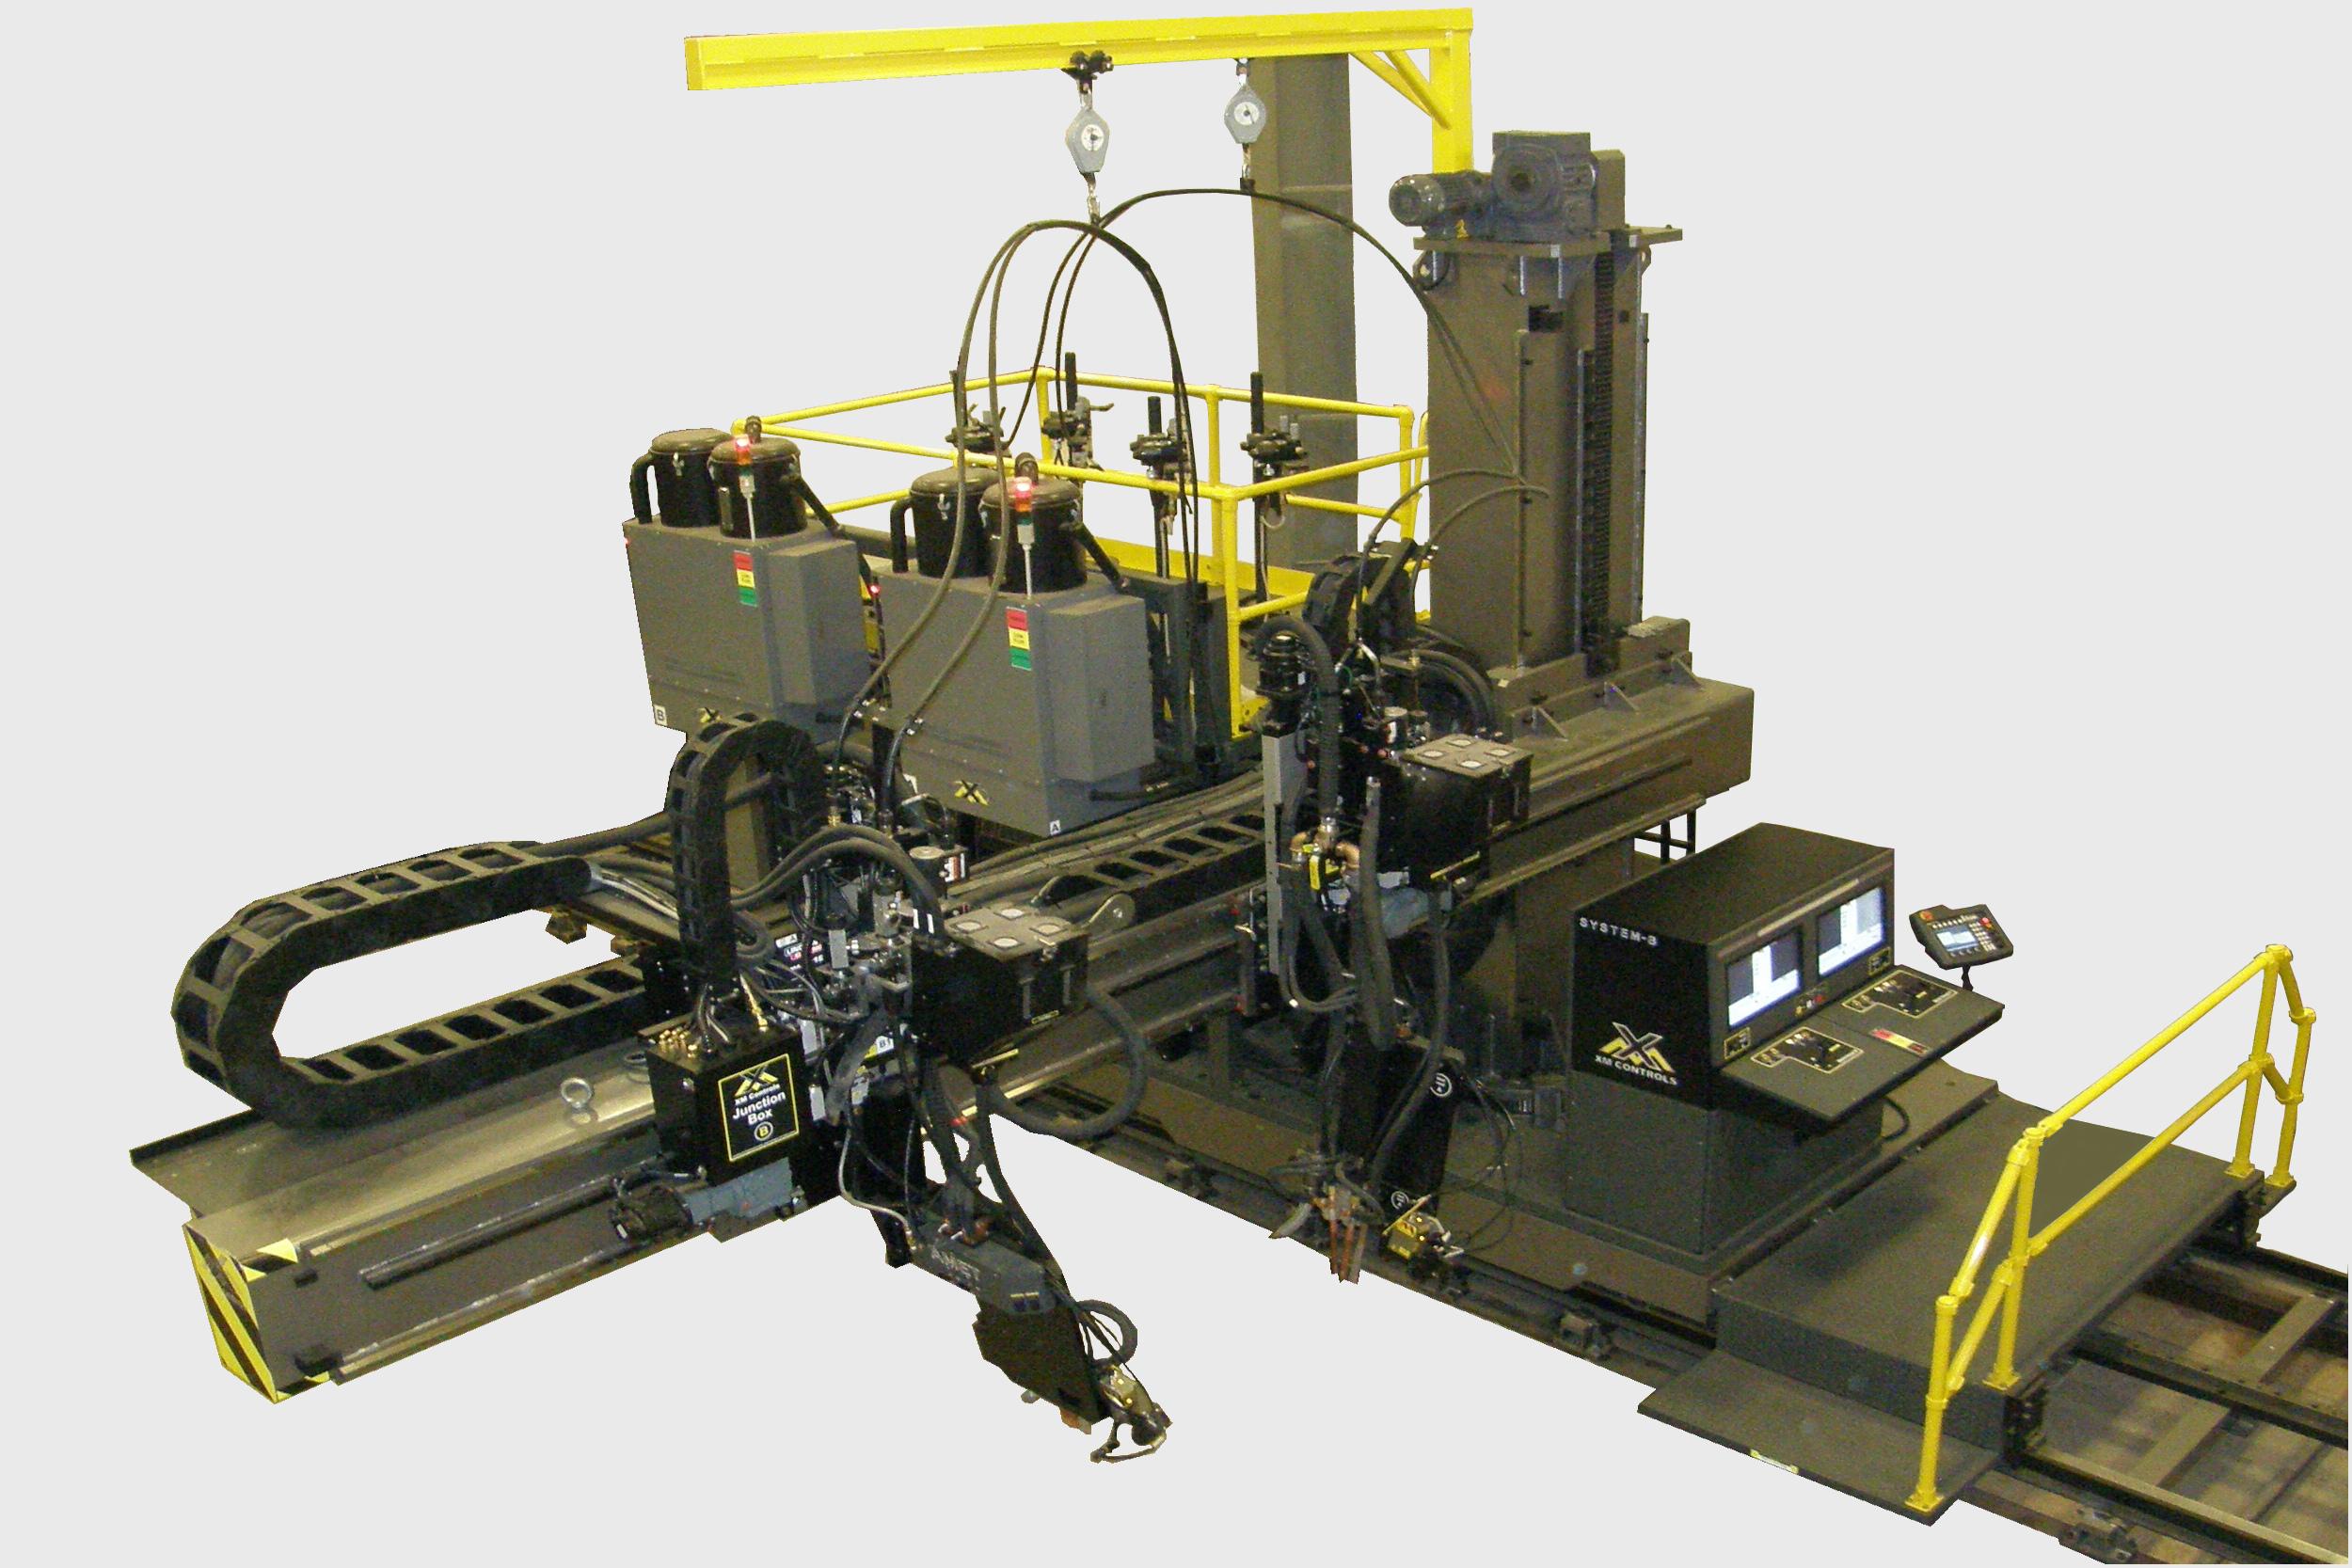 Construction welding automation